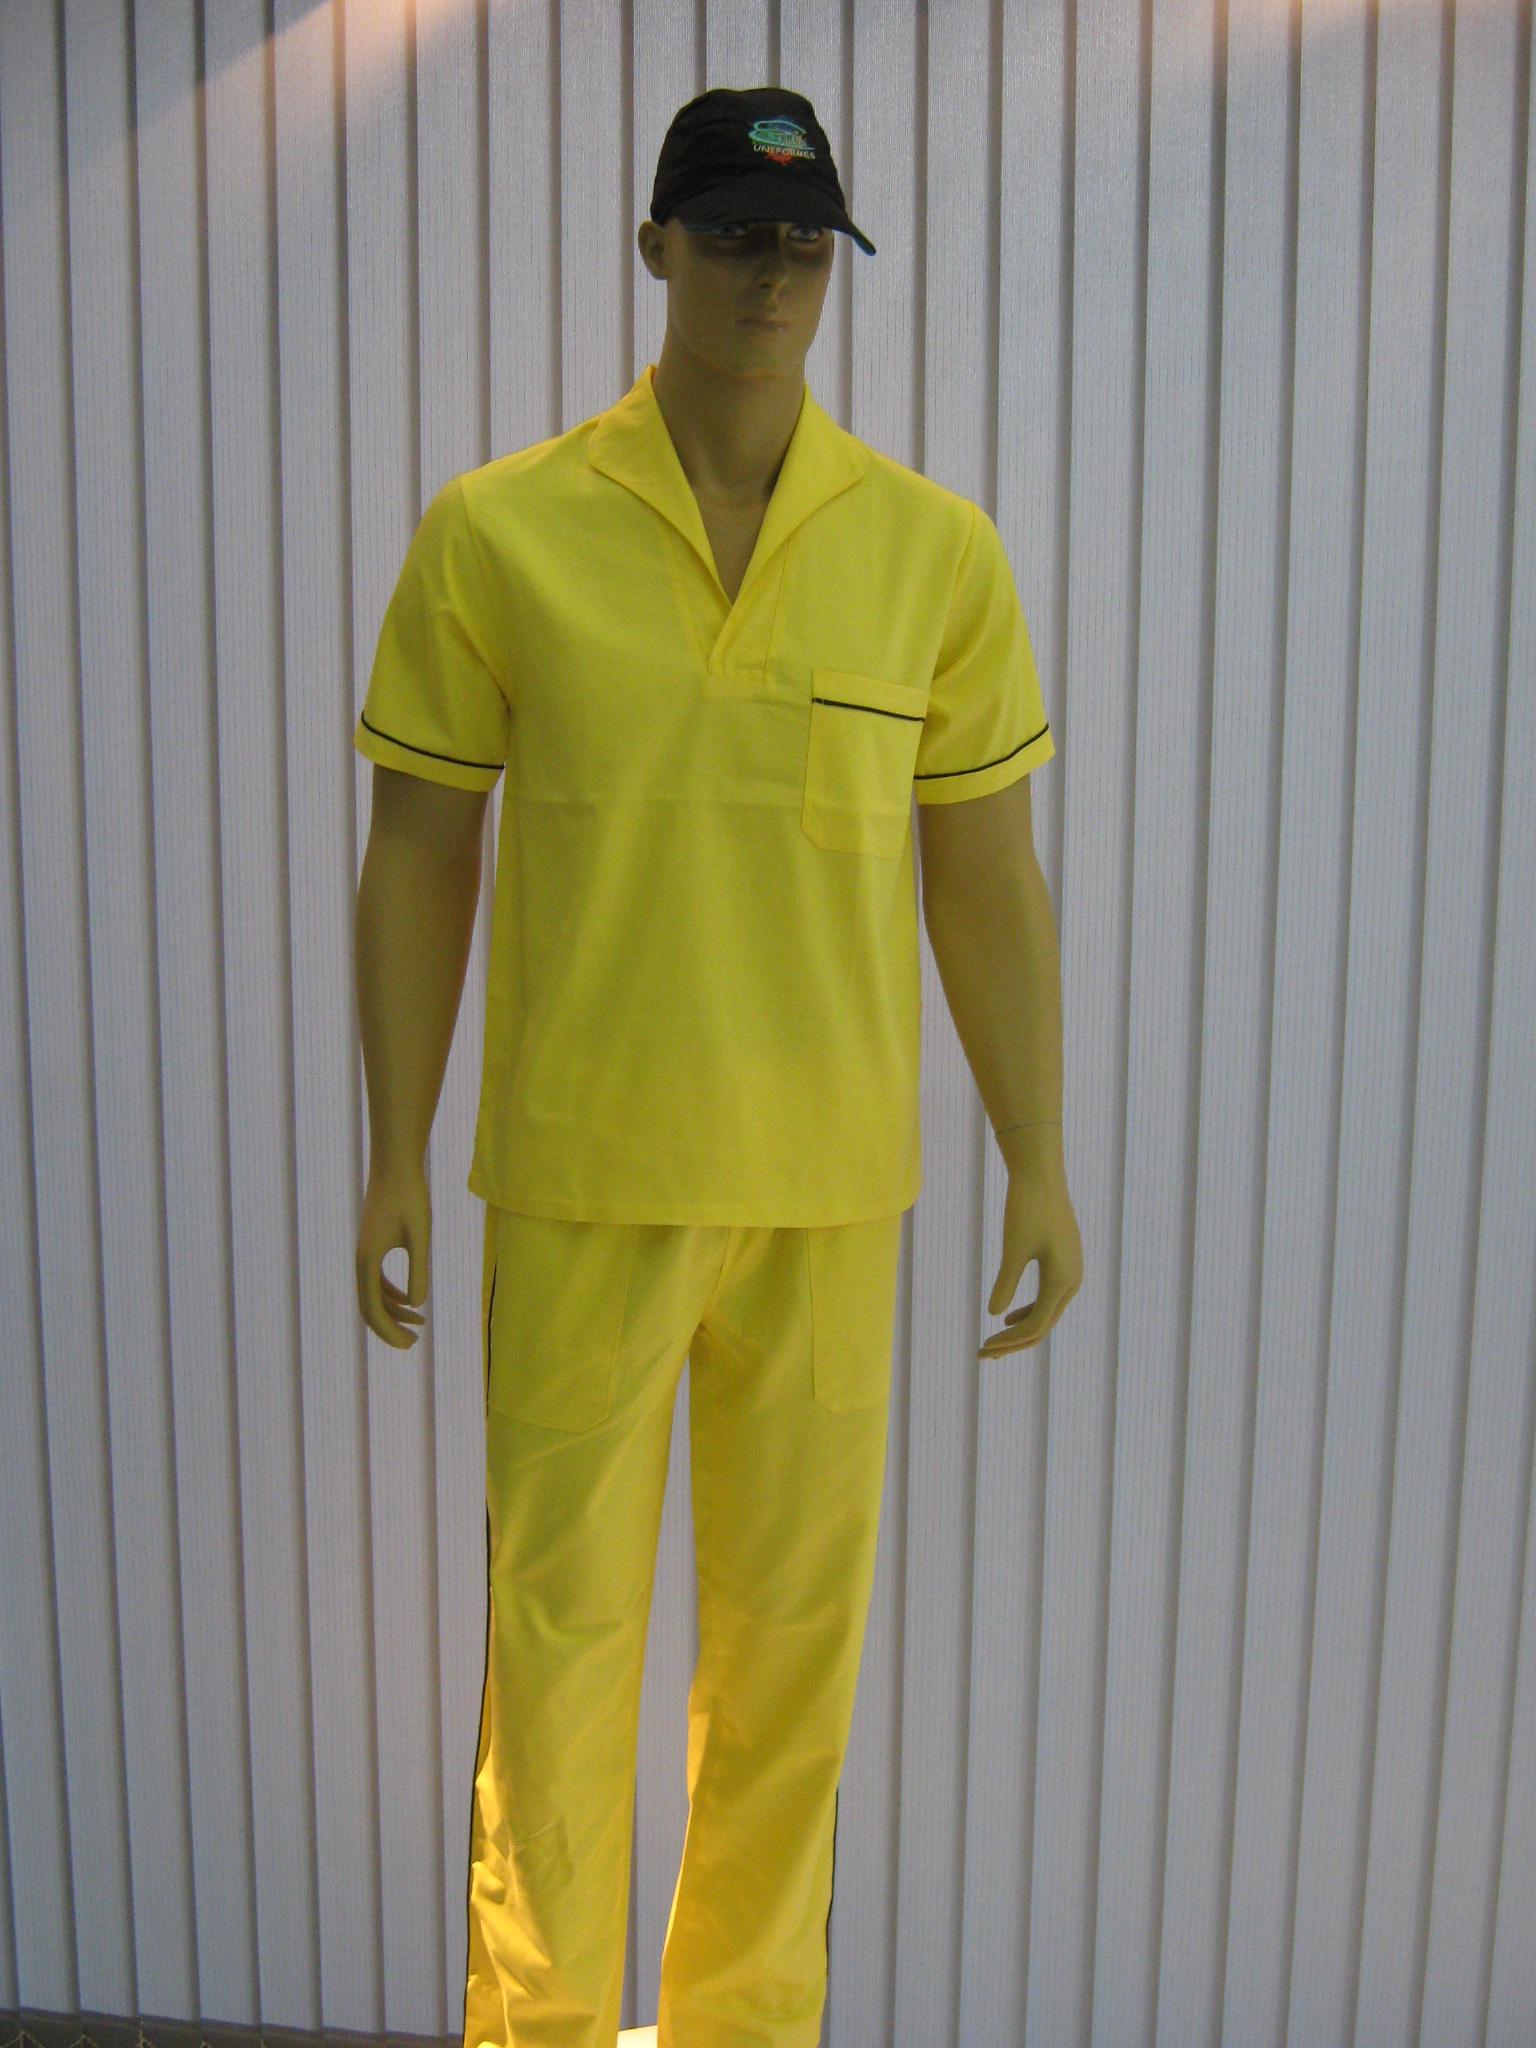 Estilo uniformes - Uniformes - Modelos de Uniformes